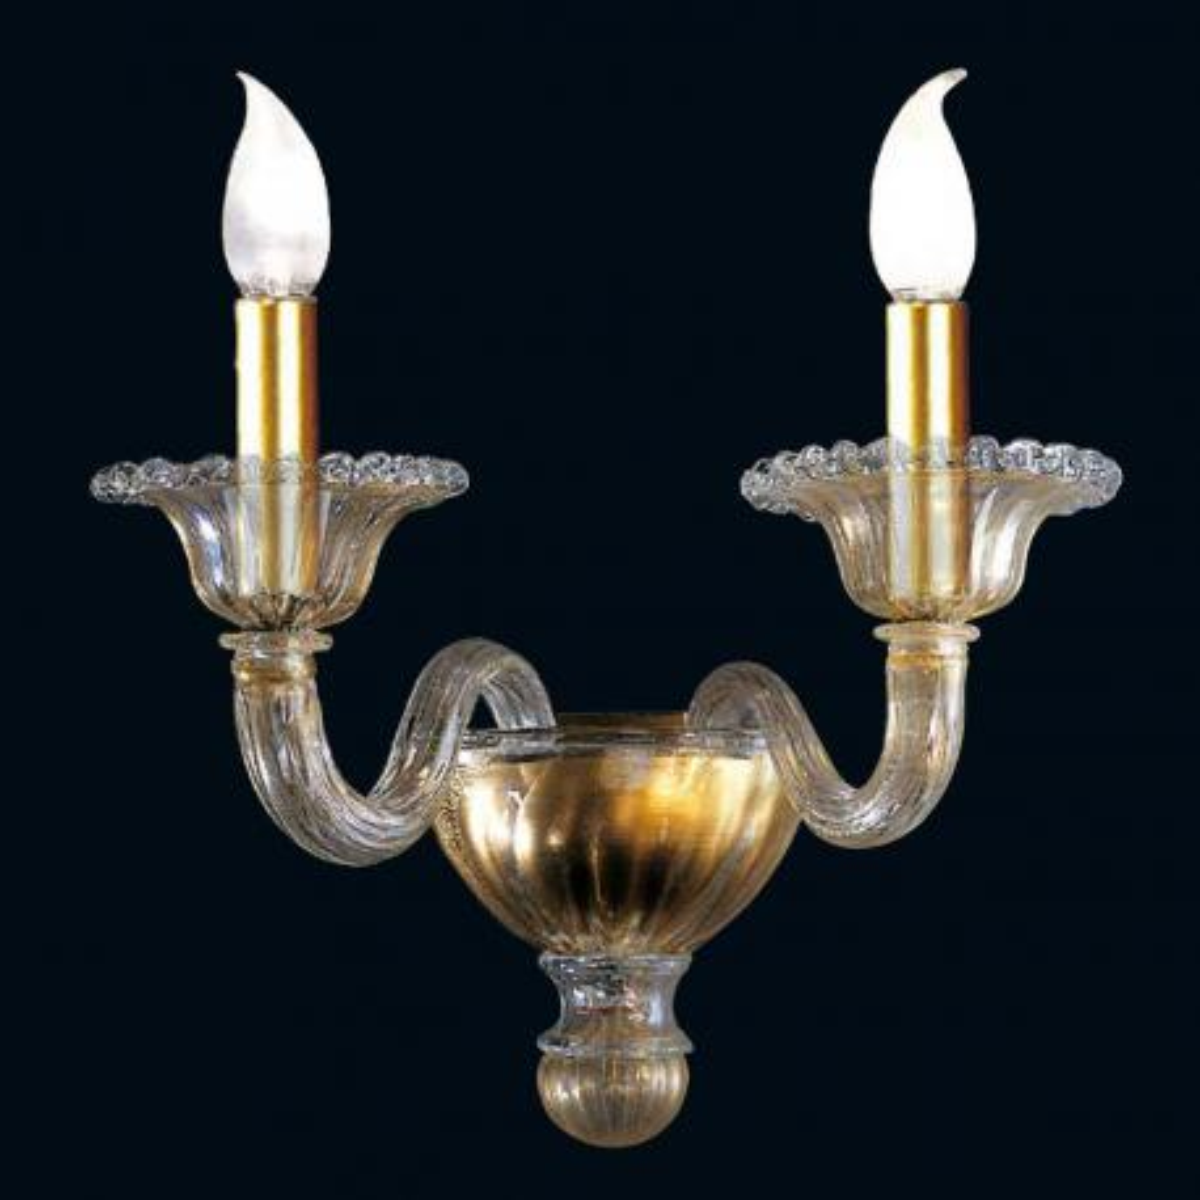 """Tish"" Murano glas wandleuchte - 2 flammig - gold"